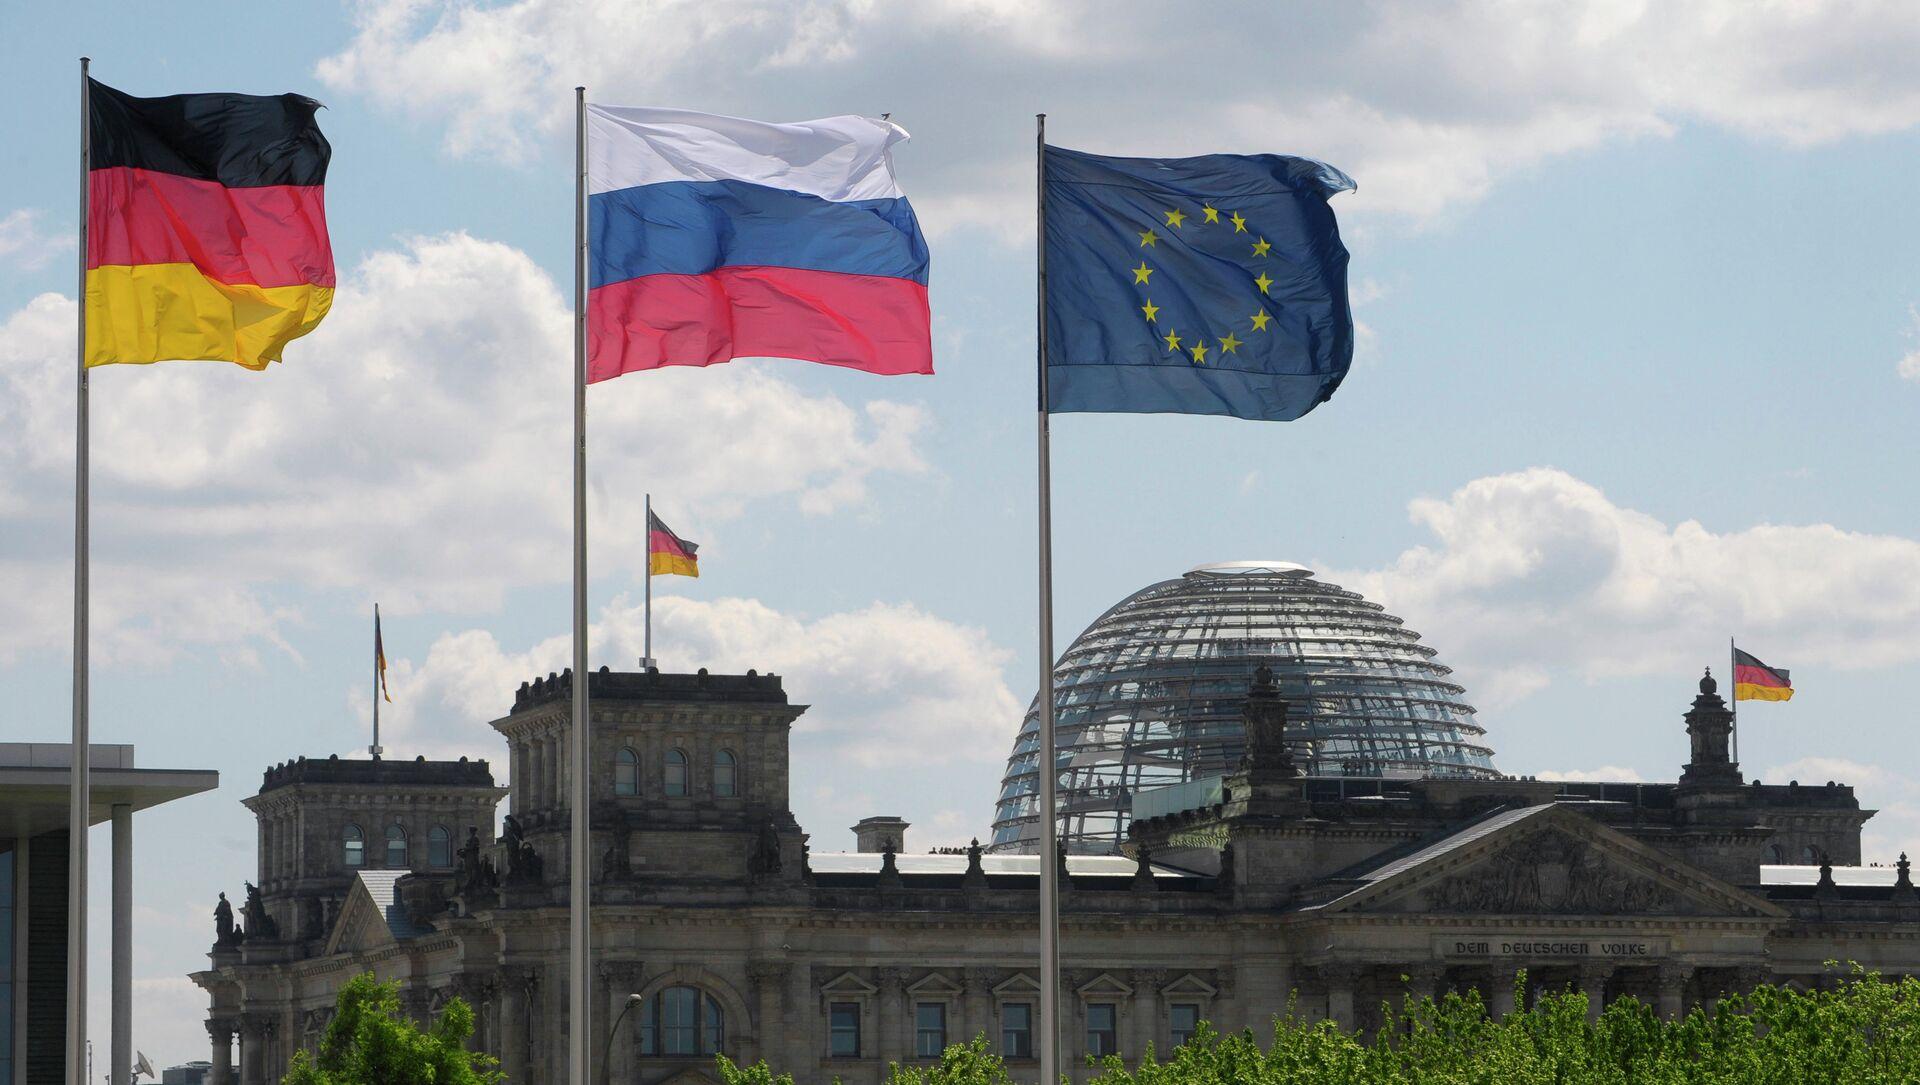 Bandiere di Germania, Russia e UE - Sputnik Italia, 1920, 22.02.2021